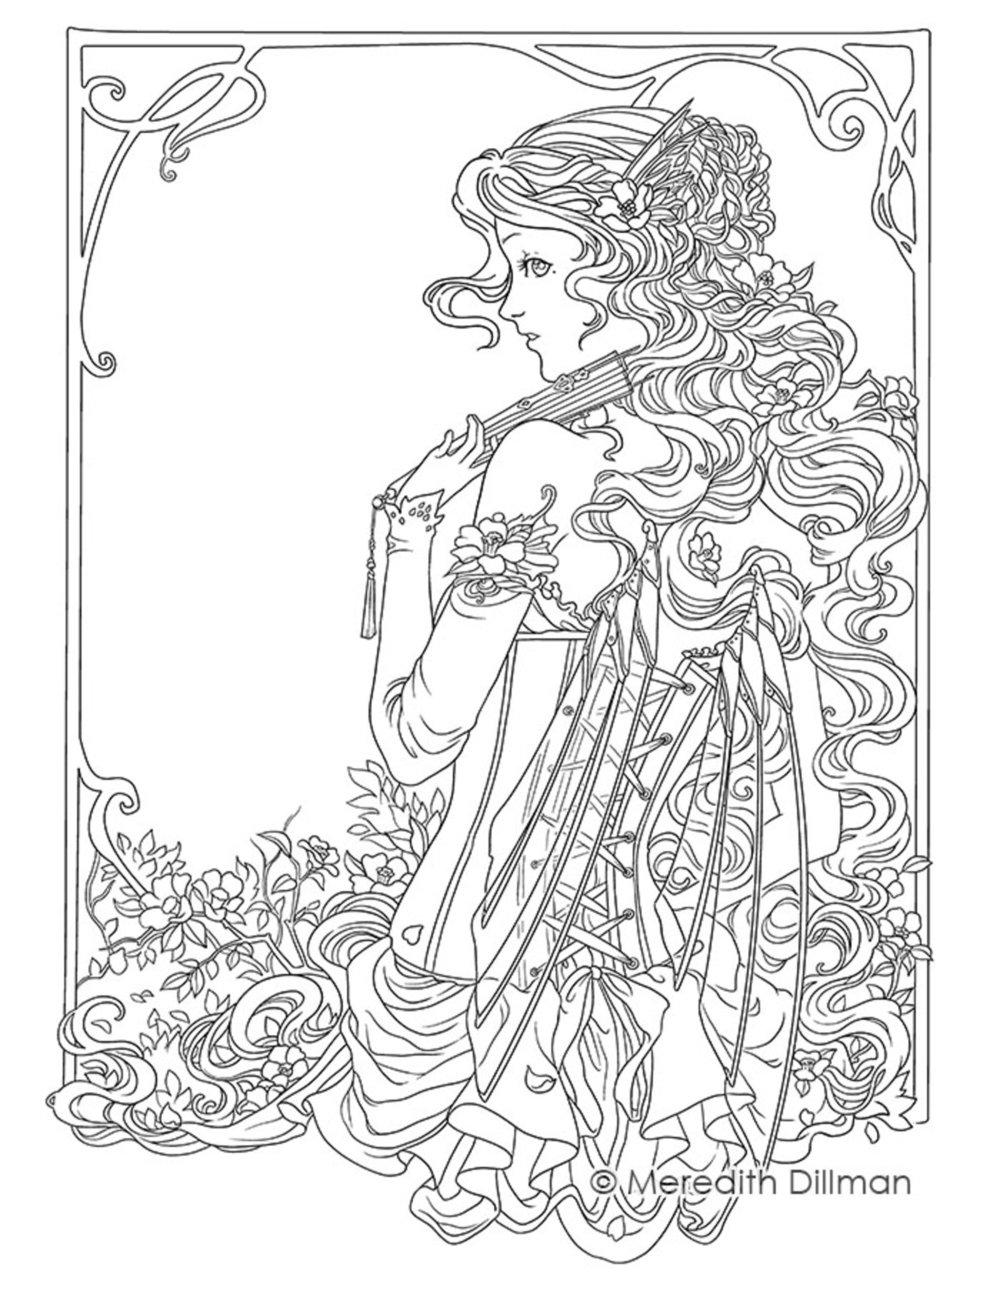 colorbookline-ladyingreen_meredithdillman.jpg